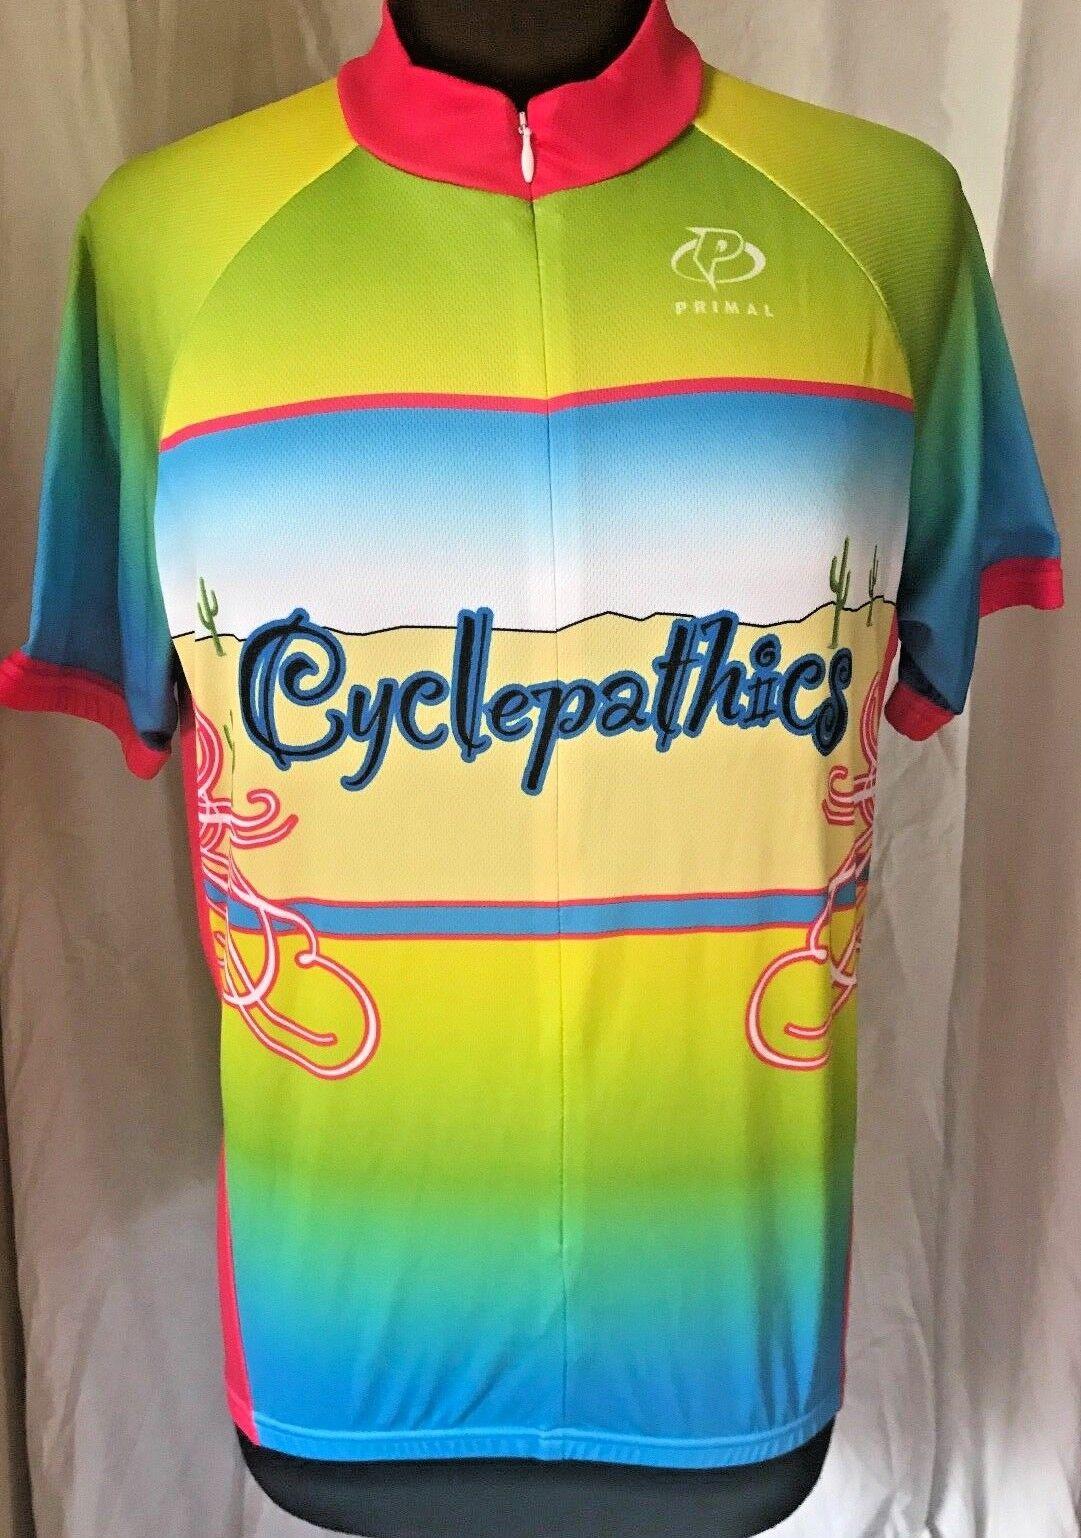 Primal Cycling Jersey Shirt  CYCLEPATHICS  Arizona Desert  Cactus Men's Medium  fantastic quality